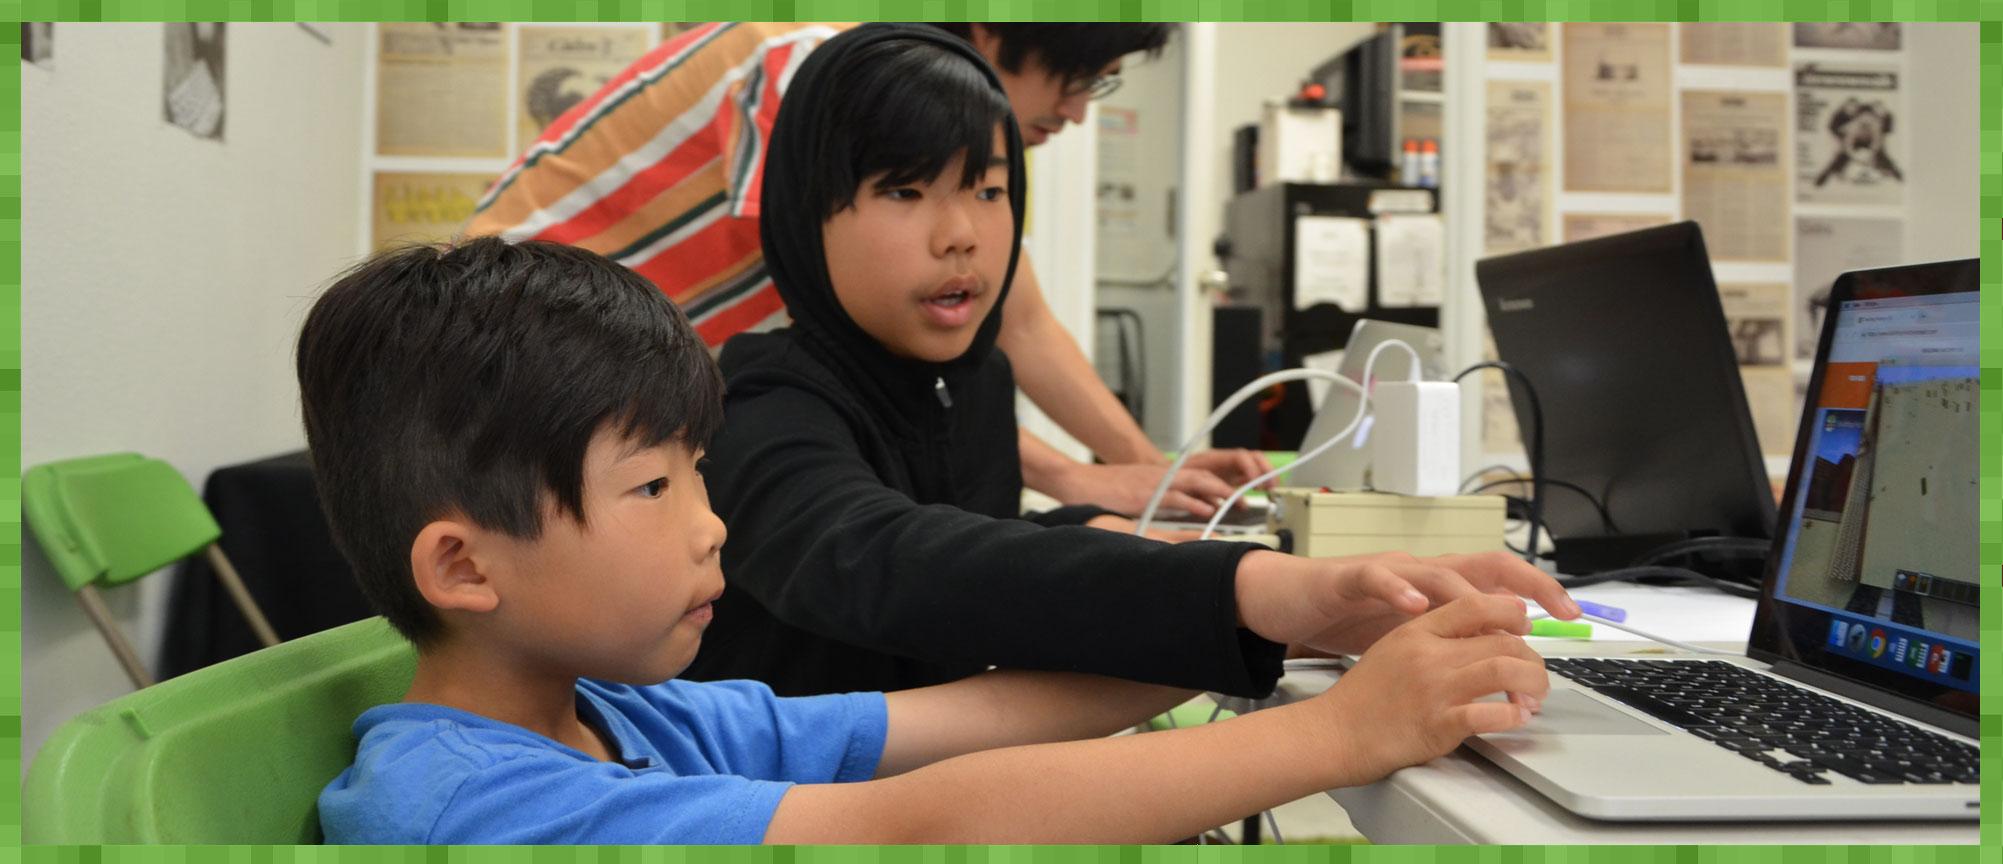 minecraft_photosHORZnew_kids.jpg